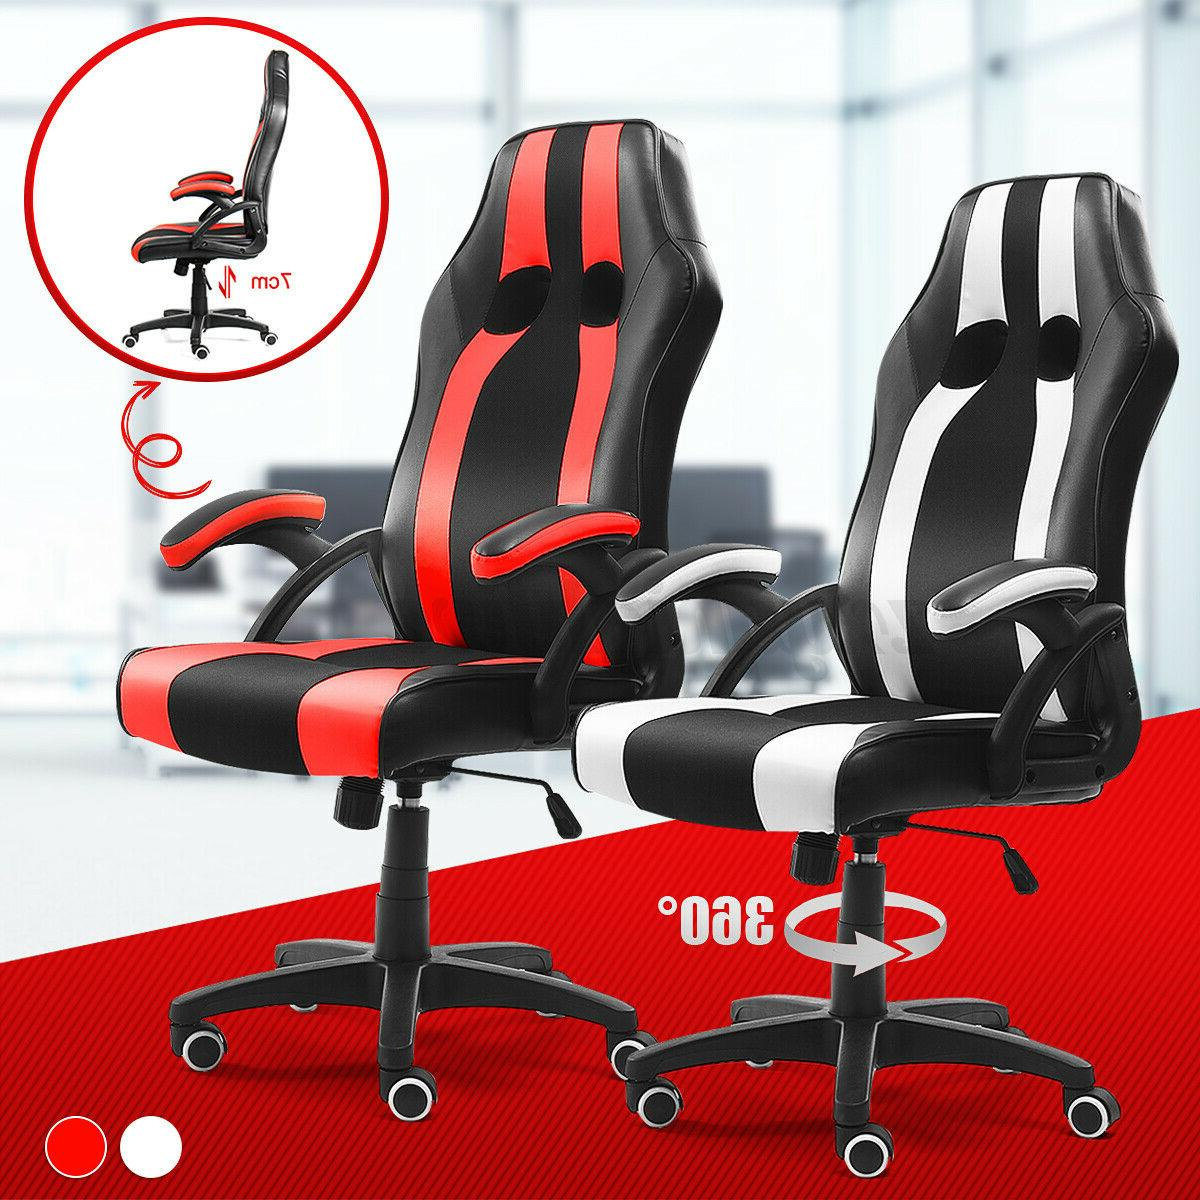 Chair Ergonomic Racing Chairs